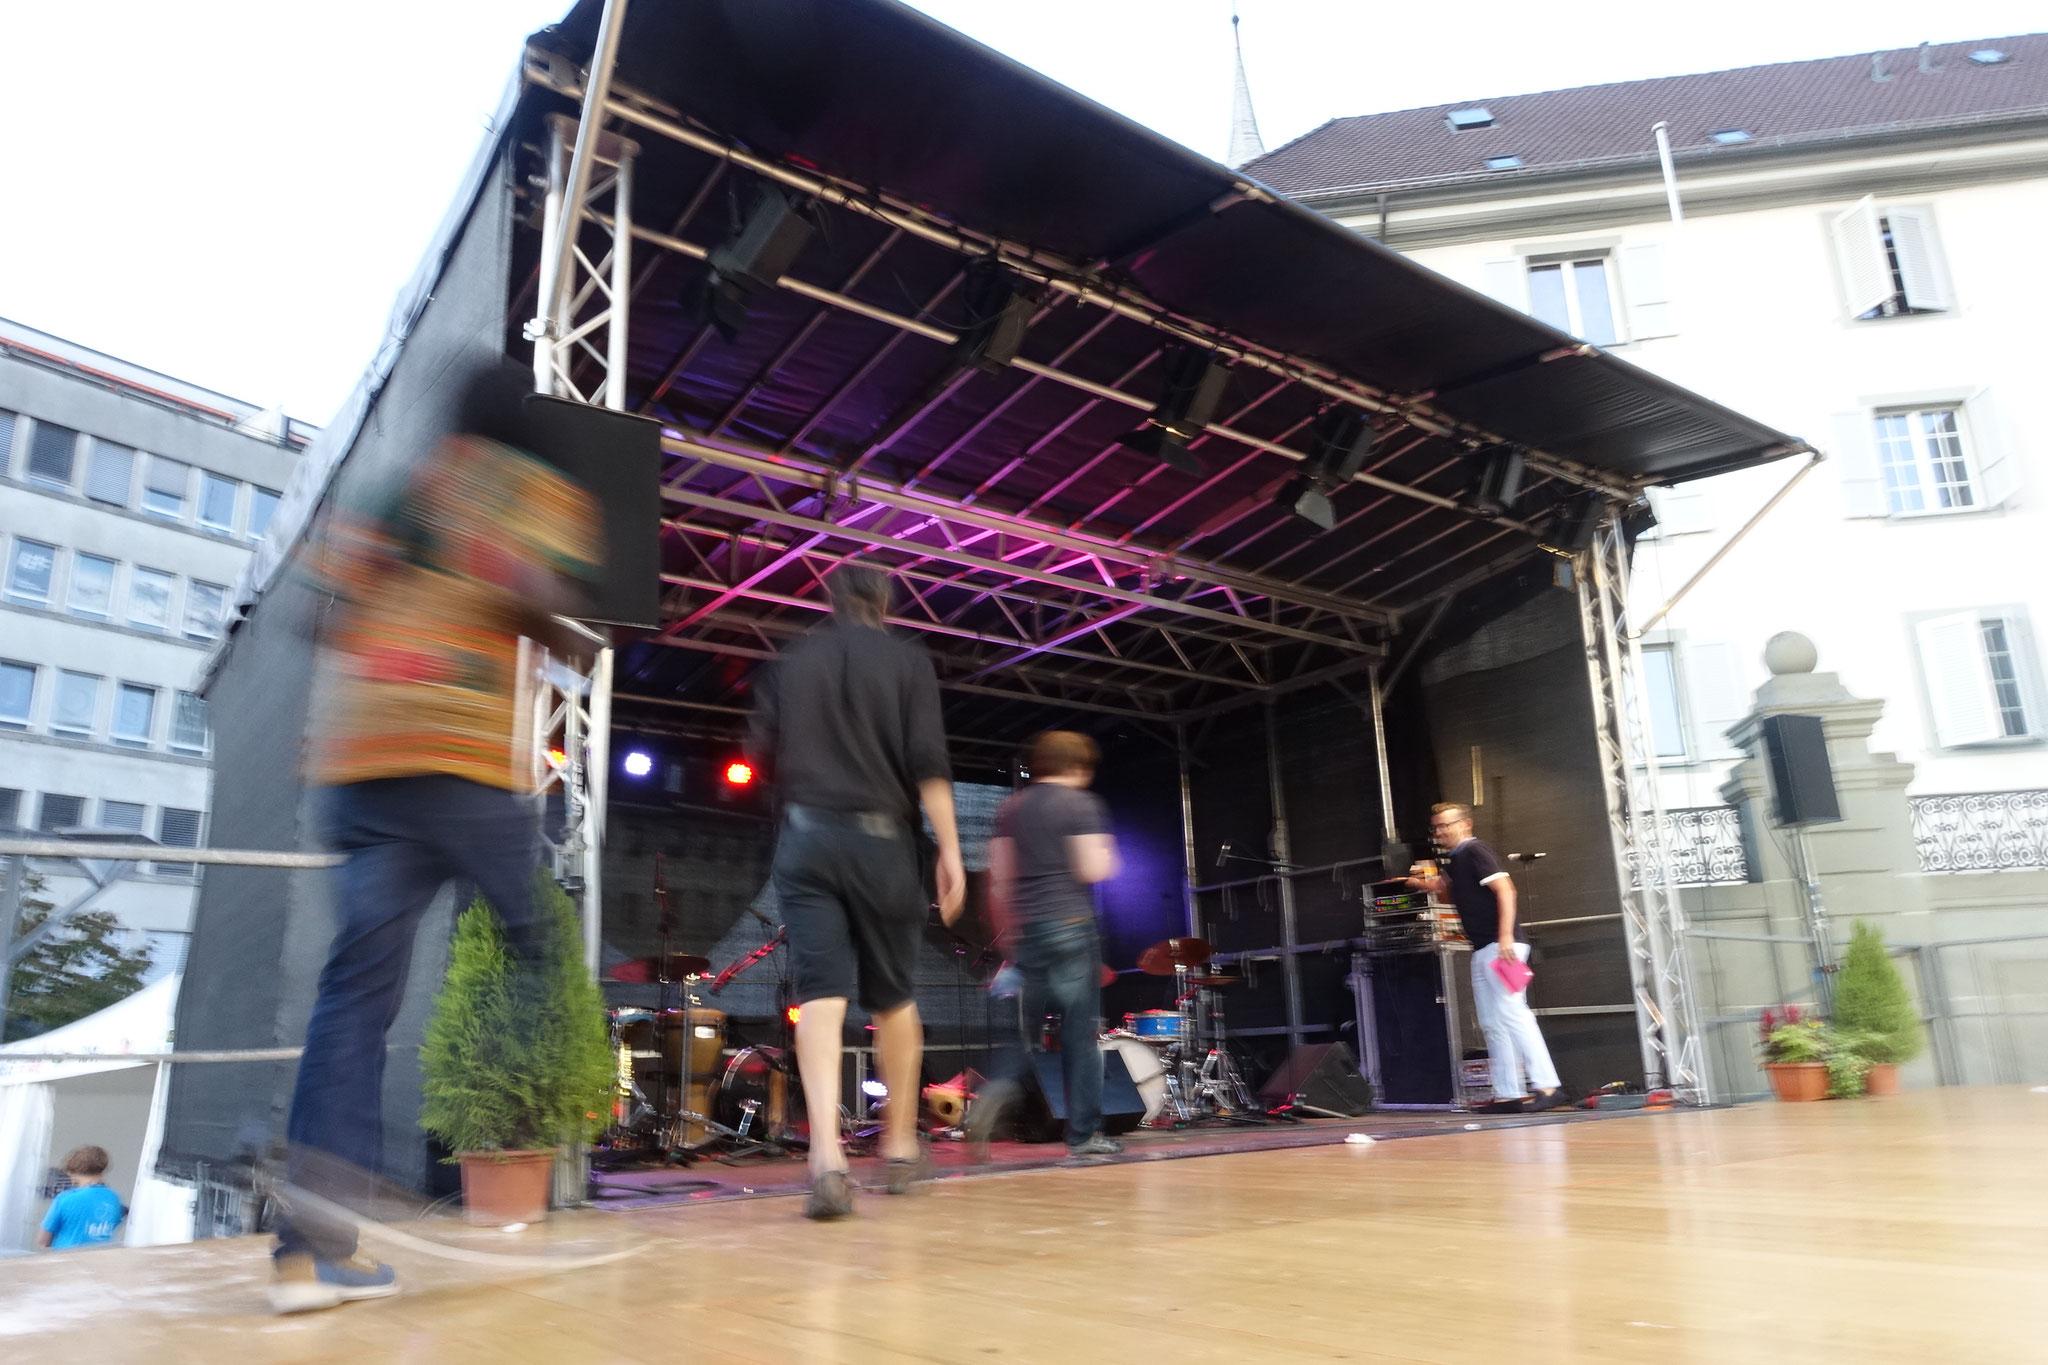 CHOUF International Folklore Festival - Friboug 15.8.2018